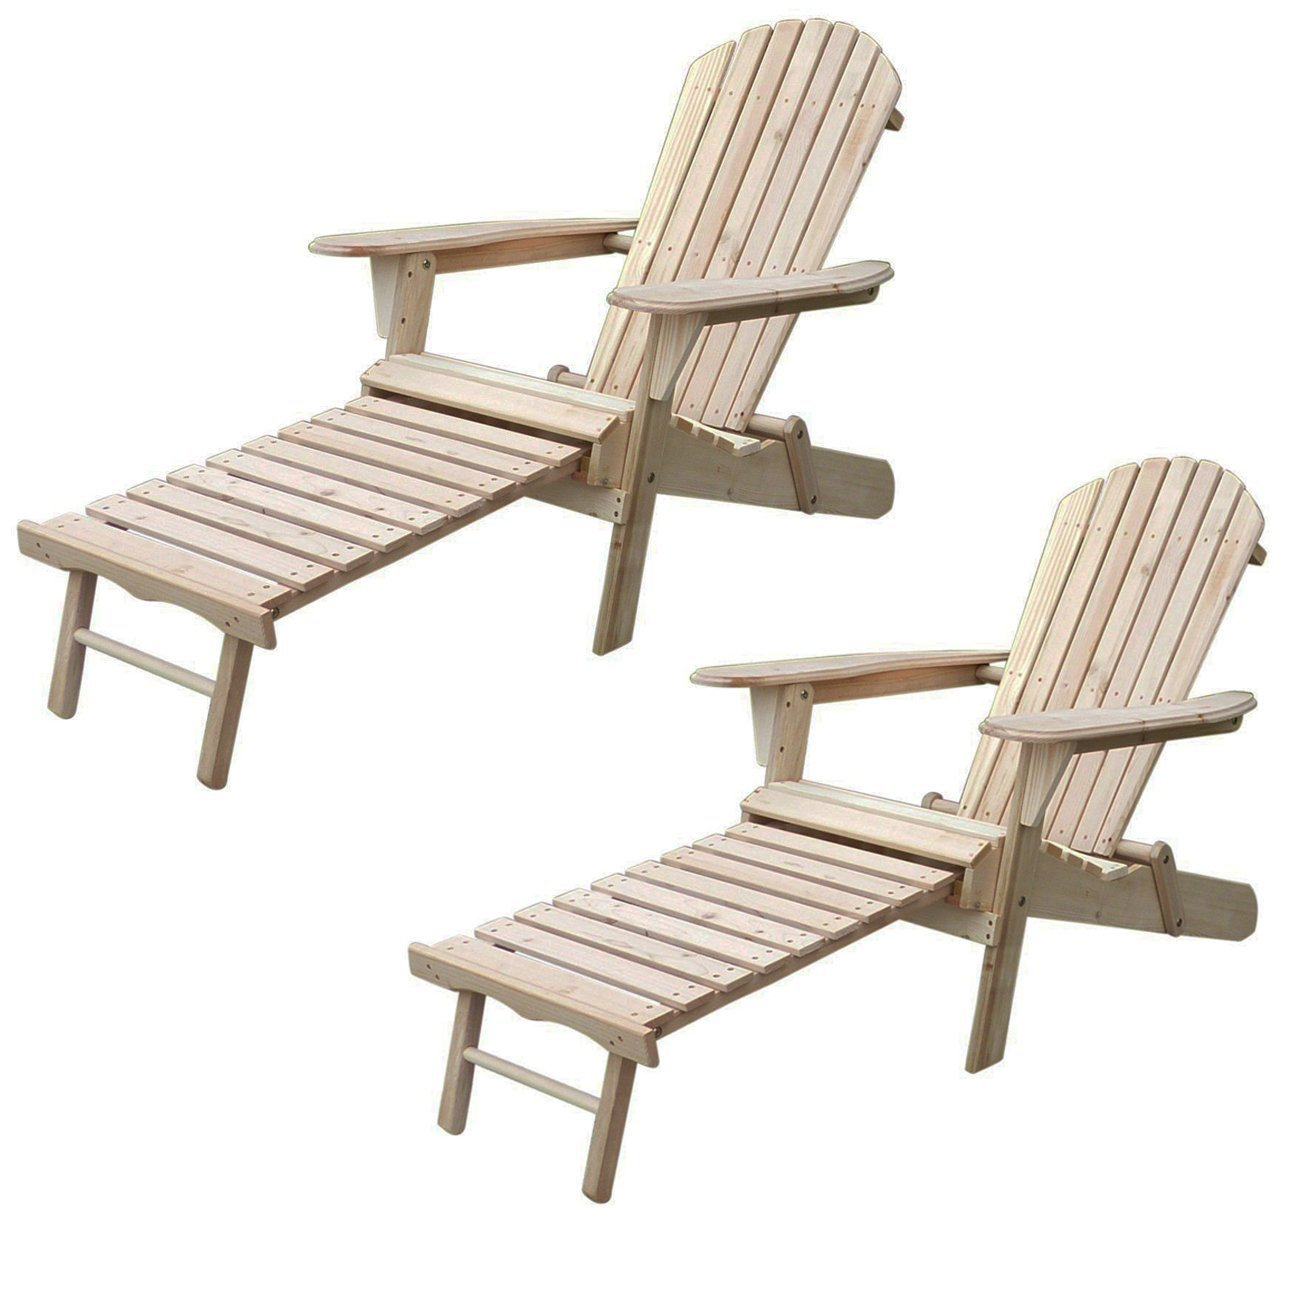 Sliverylake Outdoor Wood Adirondack Chair Chaise (2)